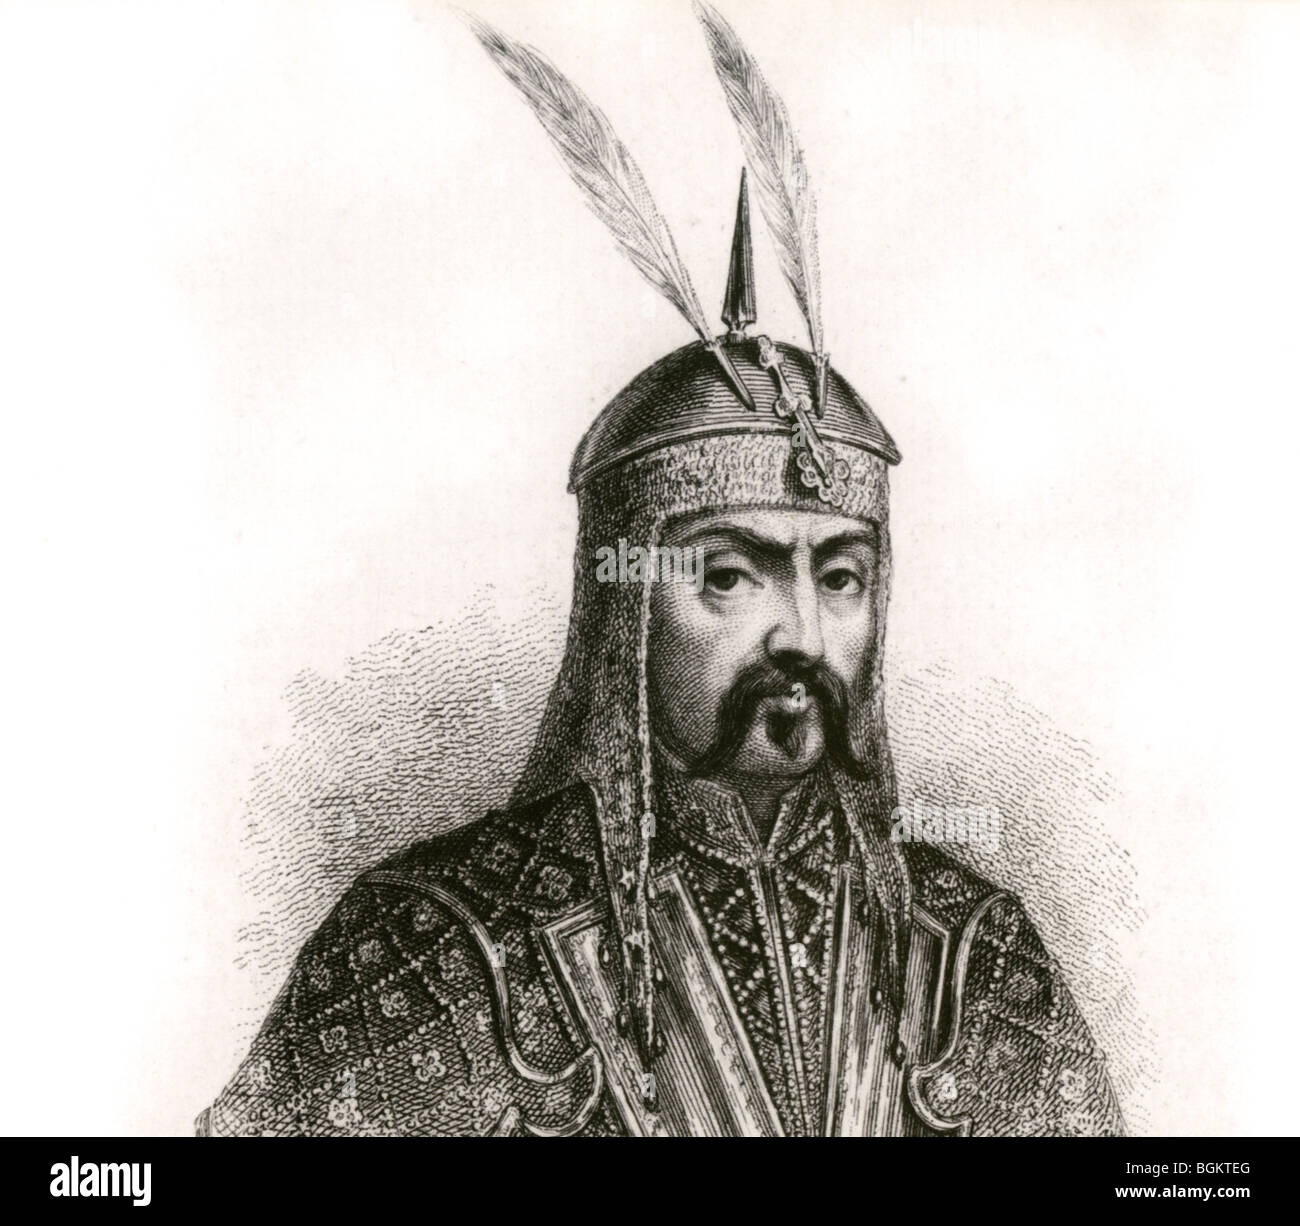 Genghis Khan Stock Photos Genghis Khan Stock Images Alamy